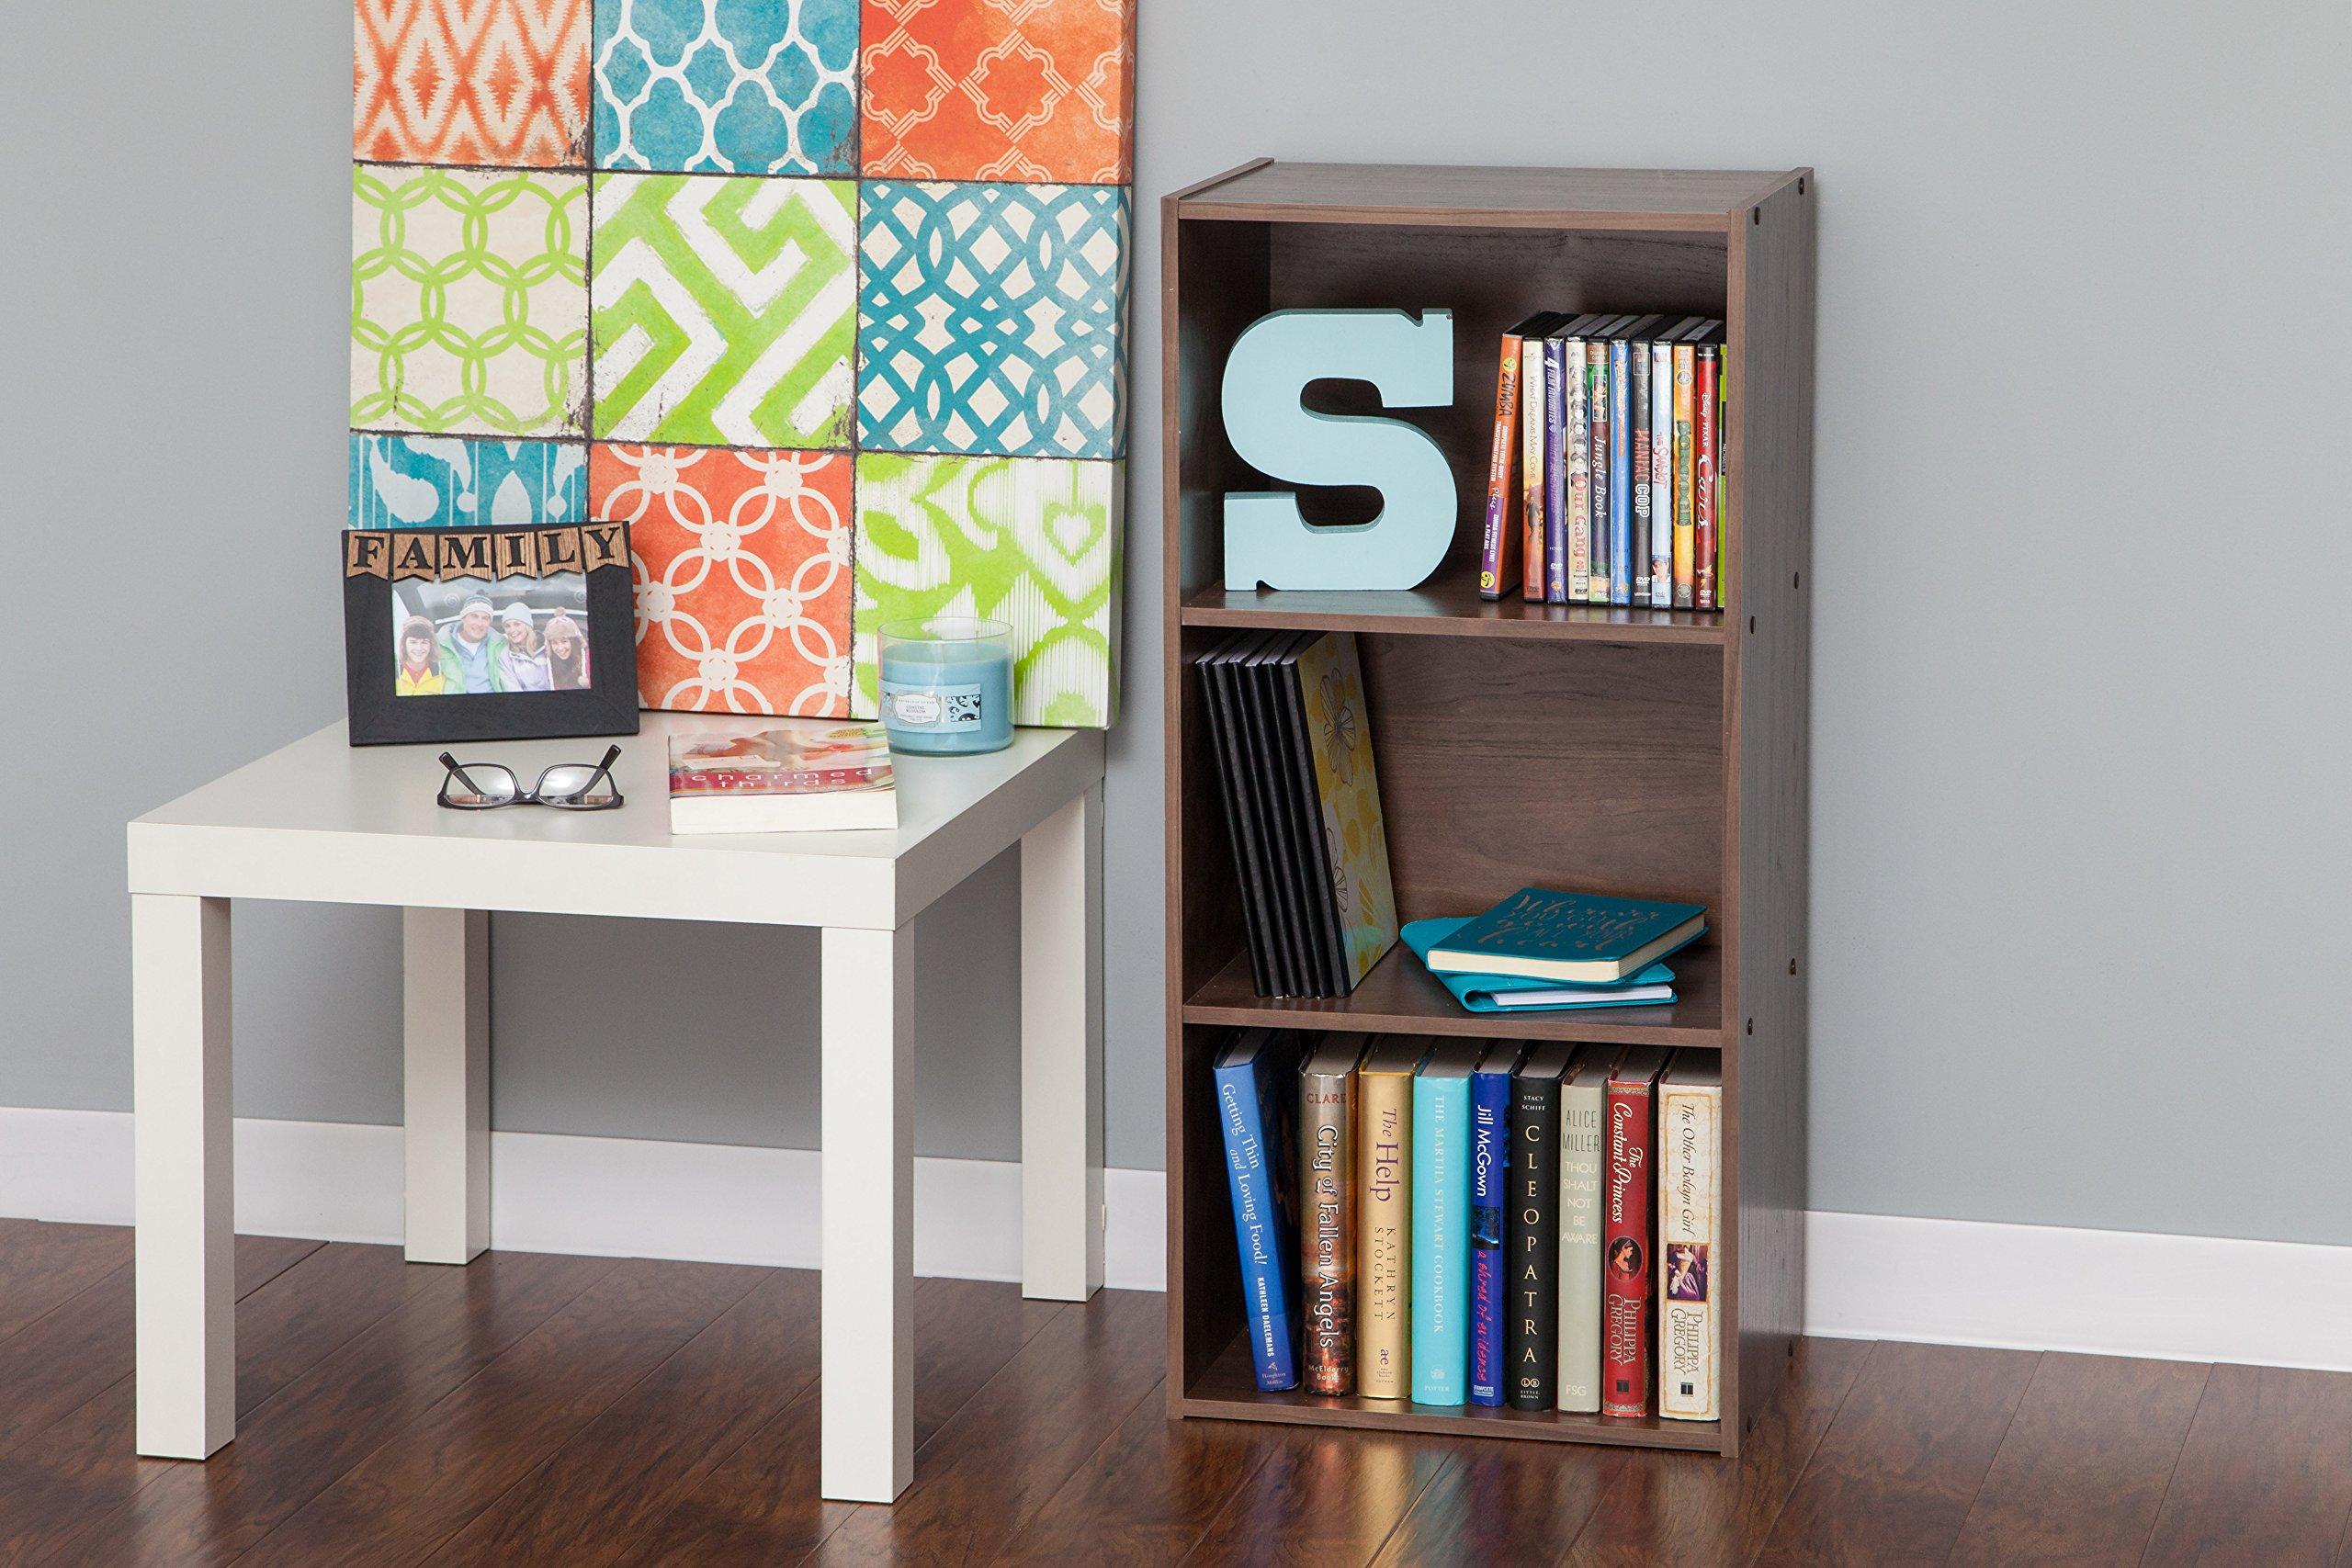 IRIS 3-Tier Basic Wood Bookcase Storage Shelf, Dark Brown by IRIS USA, Inc. (Image #6)